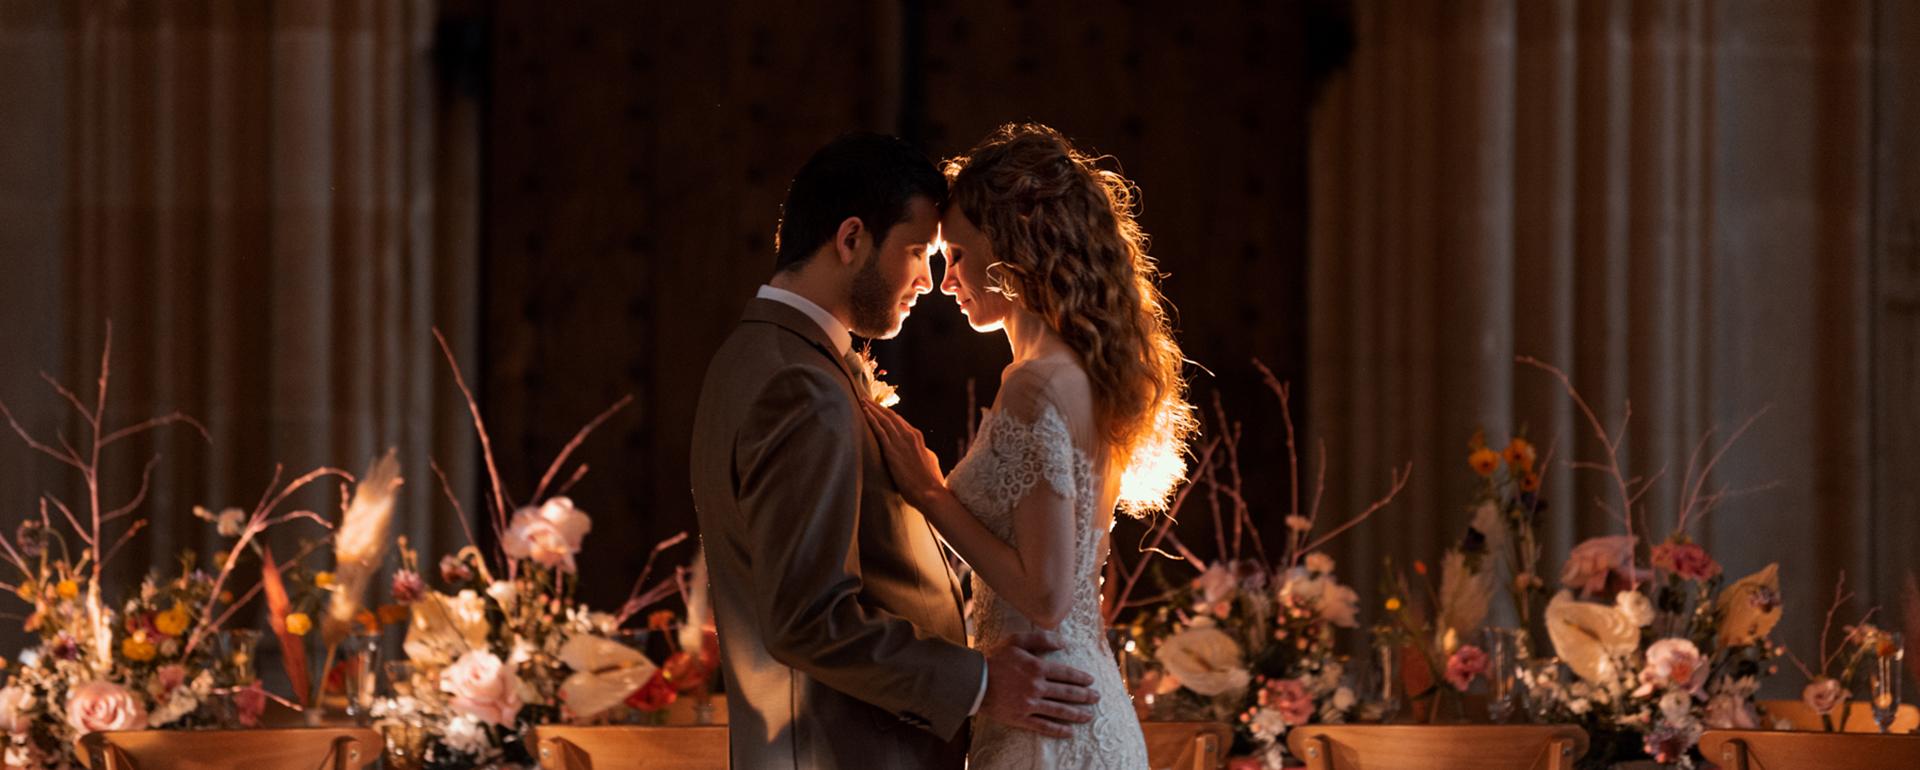 Bodleian Libraries Virtual Wedding Showcase